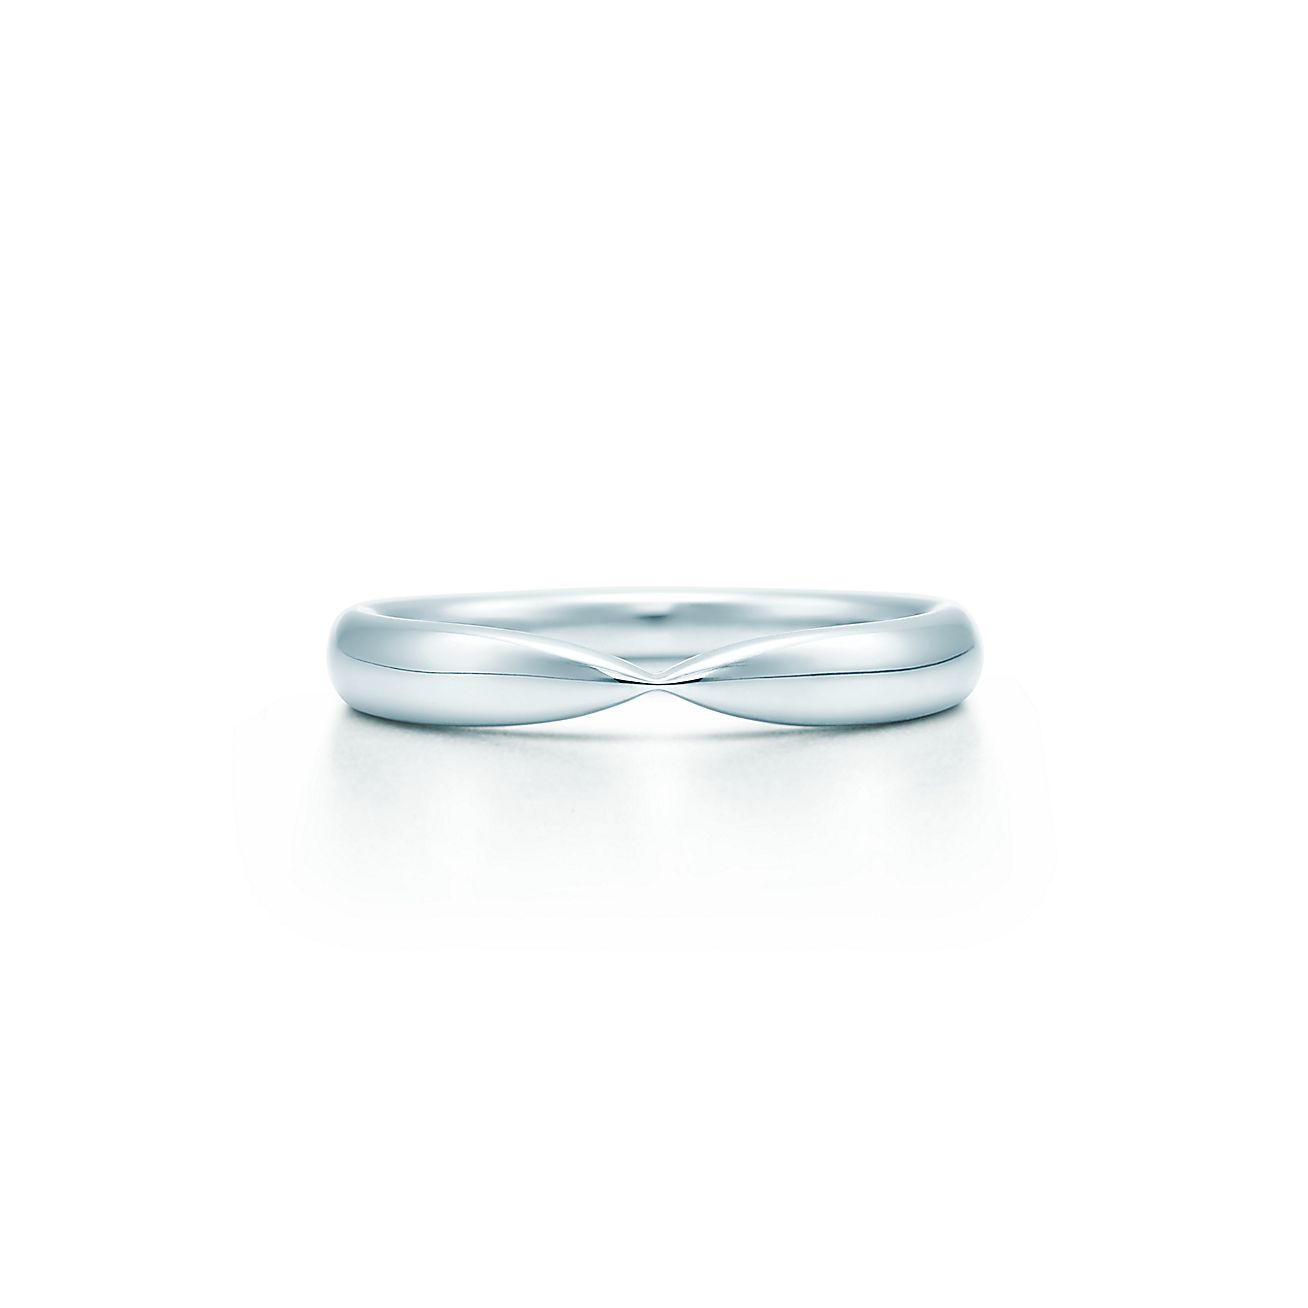 Tiffany Co Platinum Lucida 2mm Wedding Band Ring Sz 8: Tiffany Harmony™ Wedding Band In Platinum, 3 Mm Wide